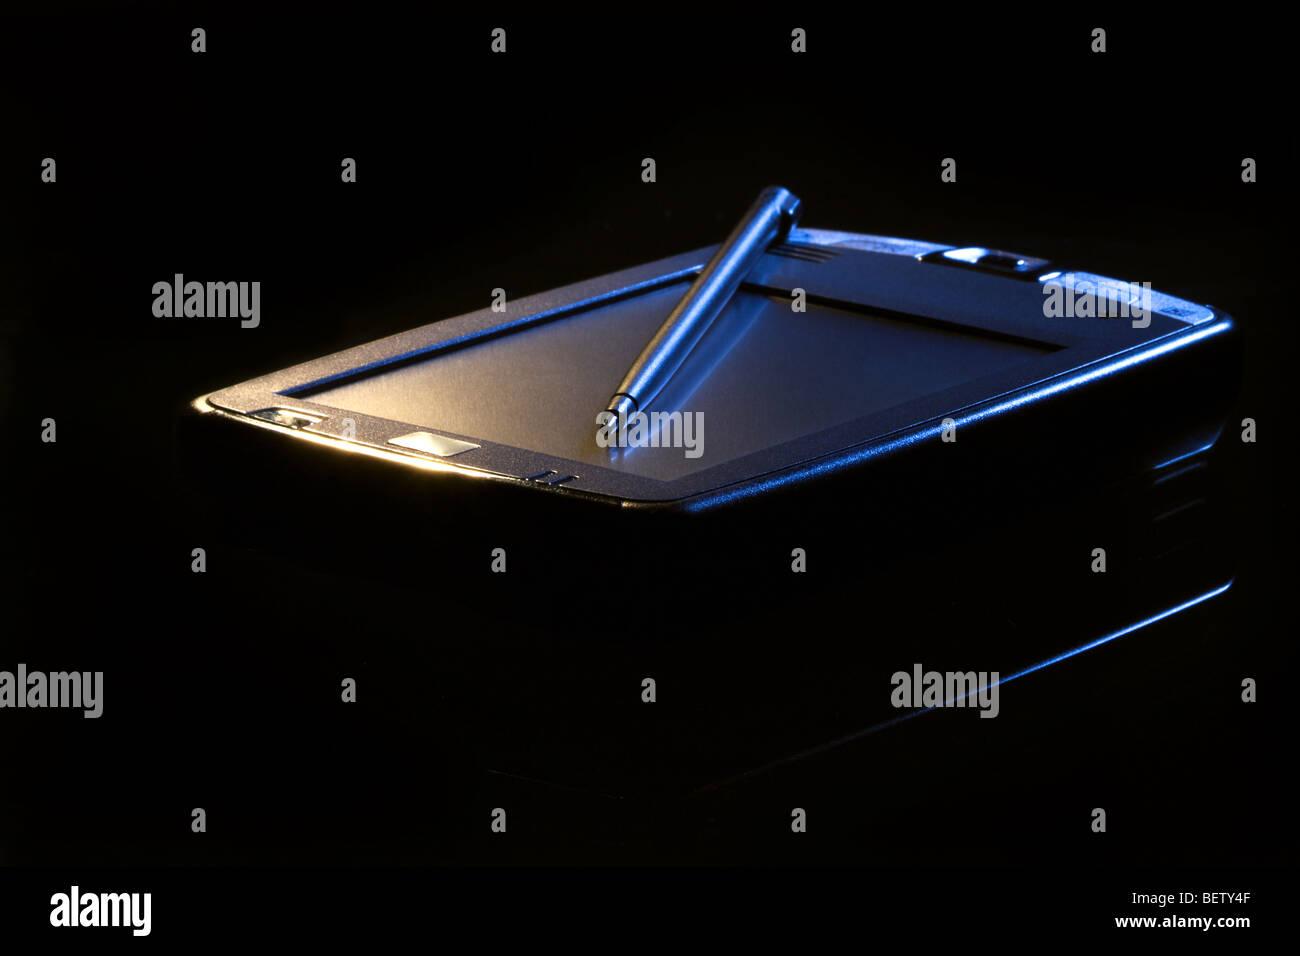 PDA in light beam. Black background. Close-up scene. - Stock Image